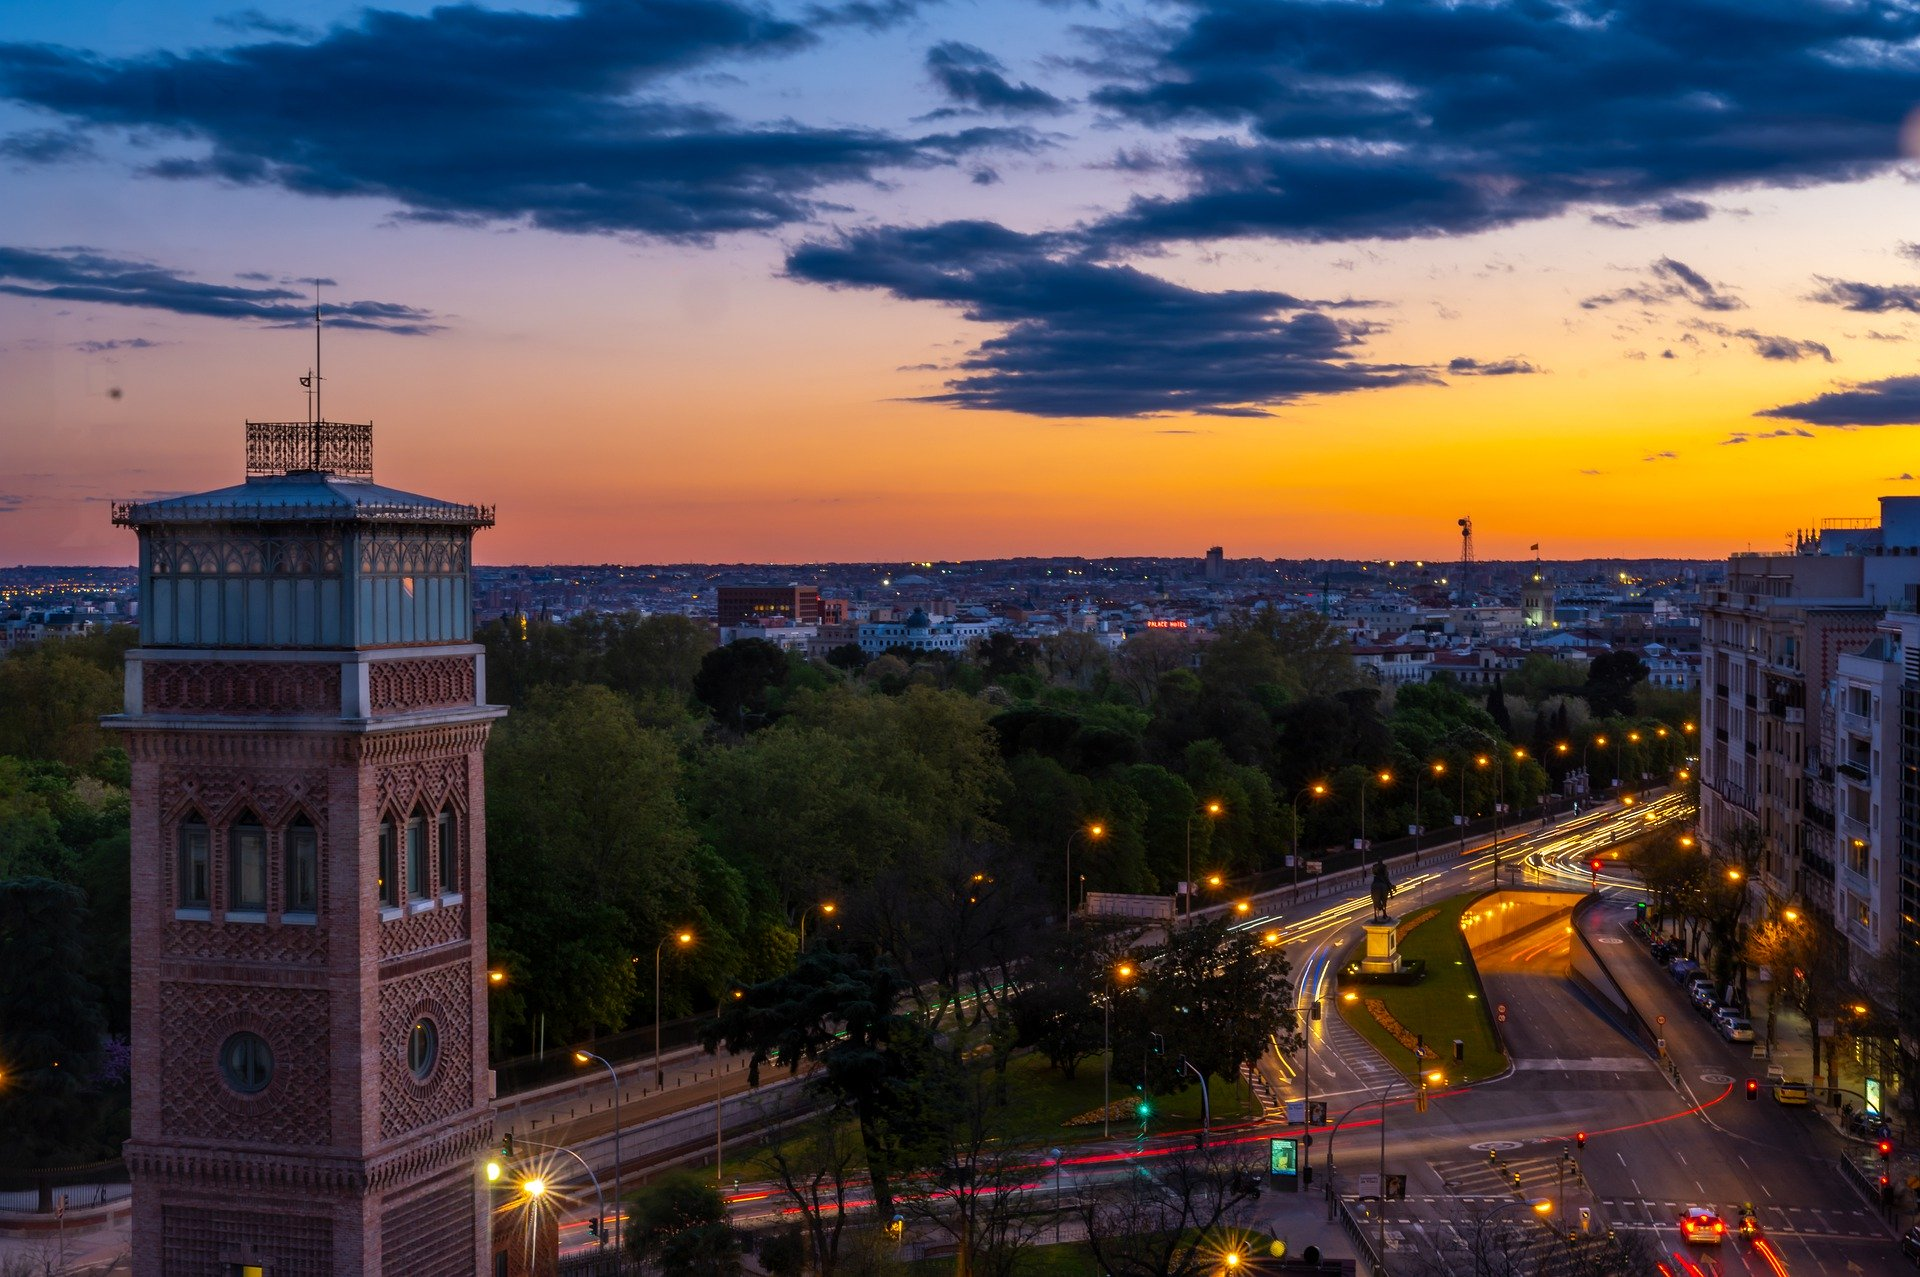 4 star hotel in the center of Madrid near city landmarks